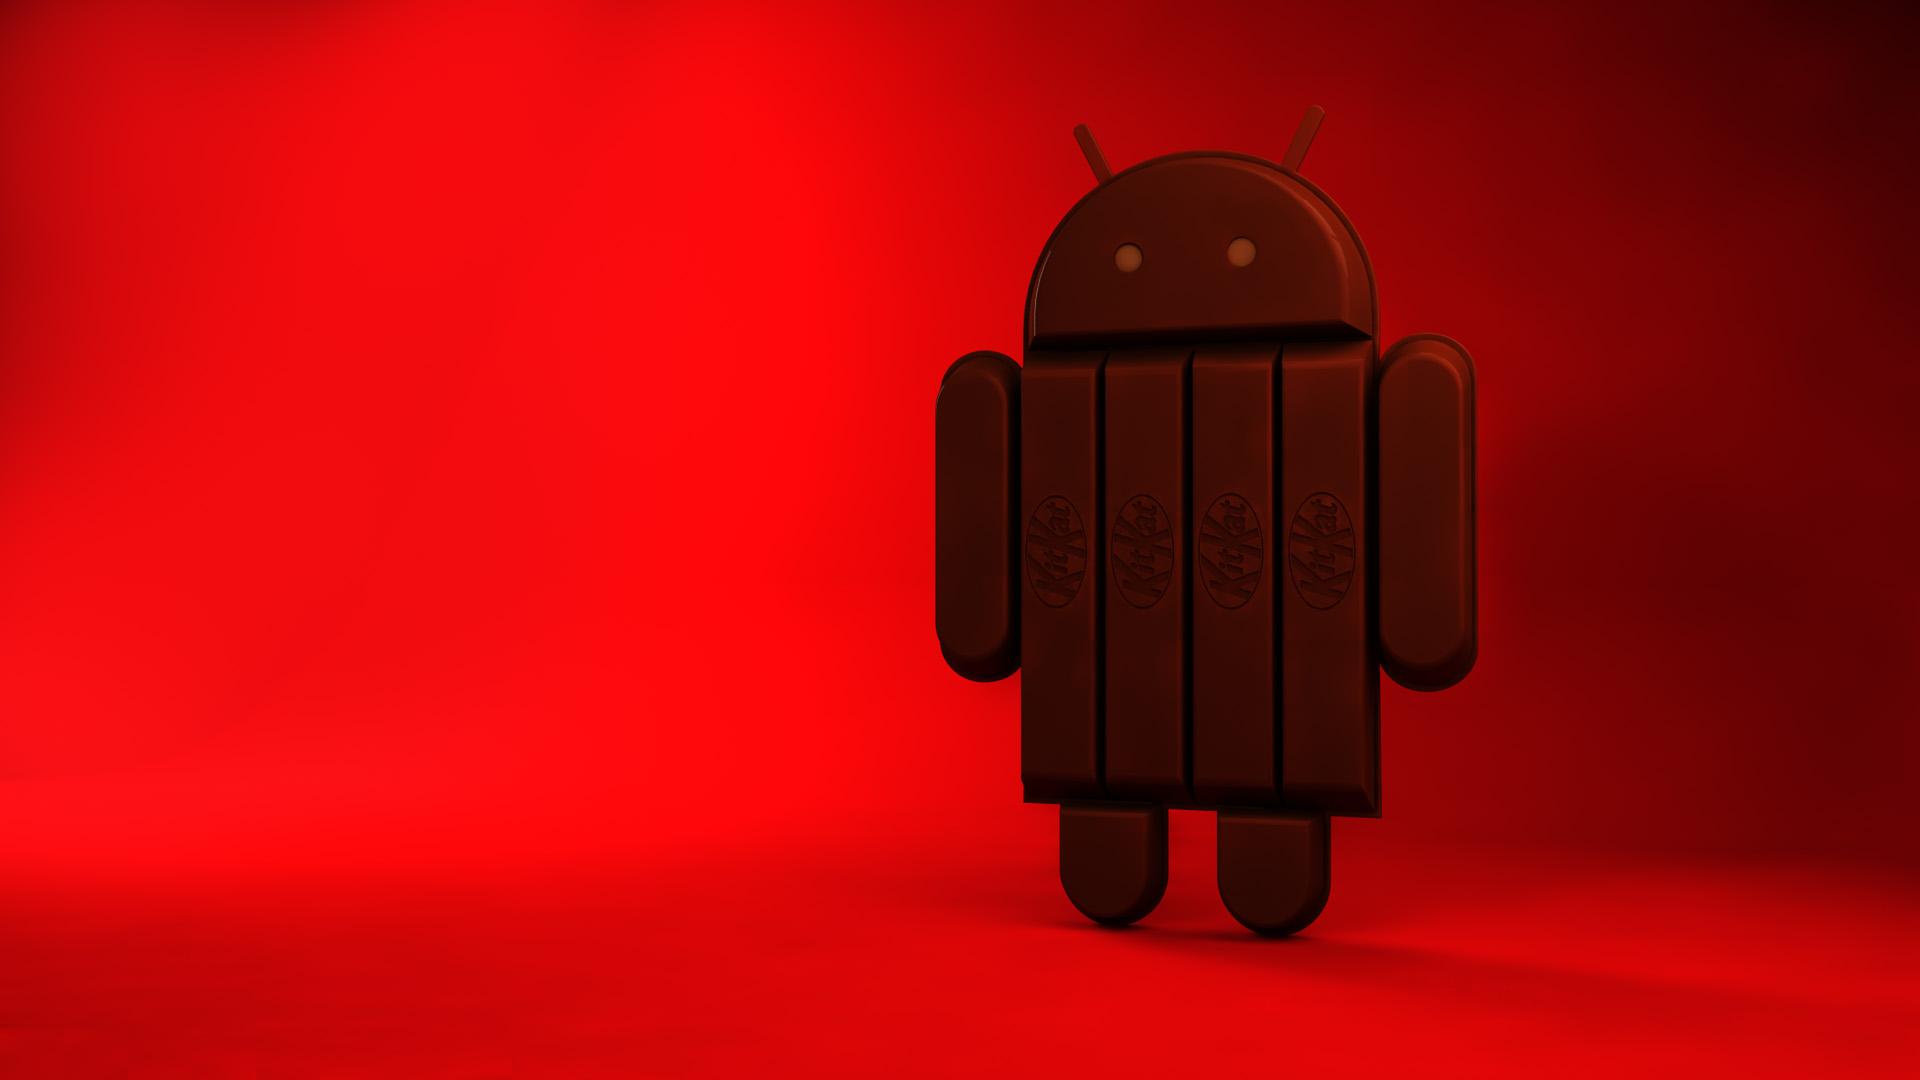 android_kit_kat.jpg